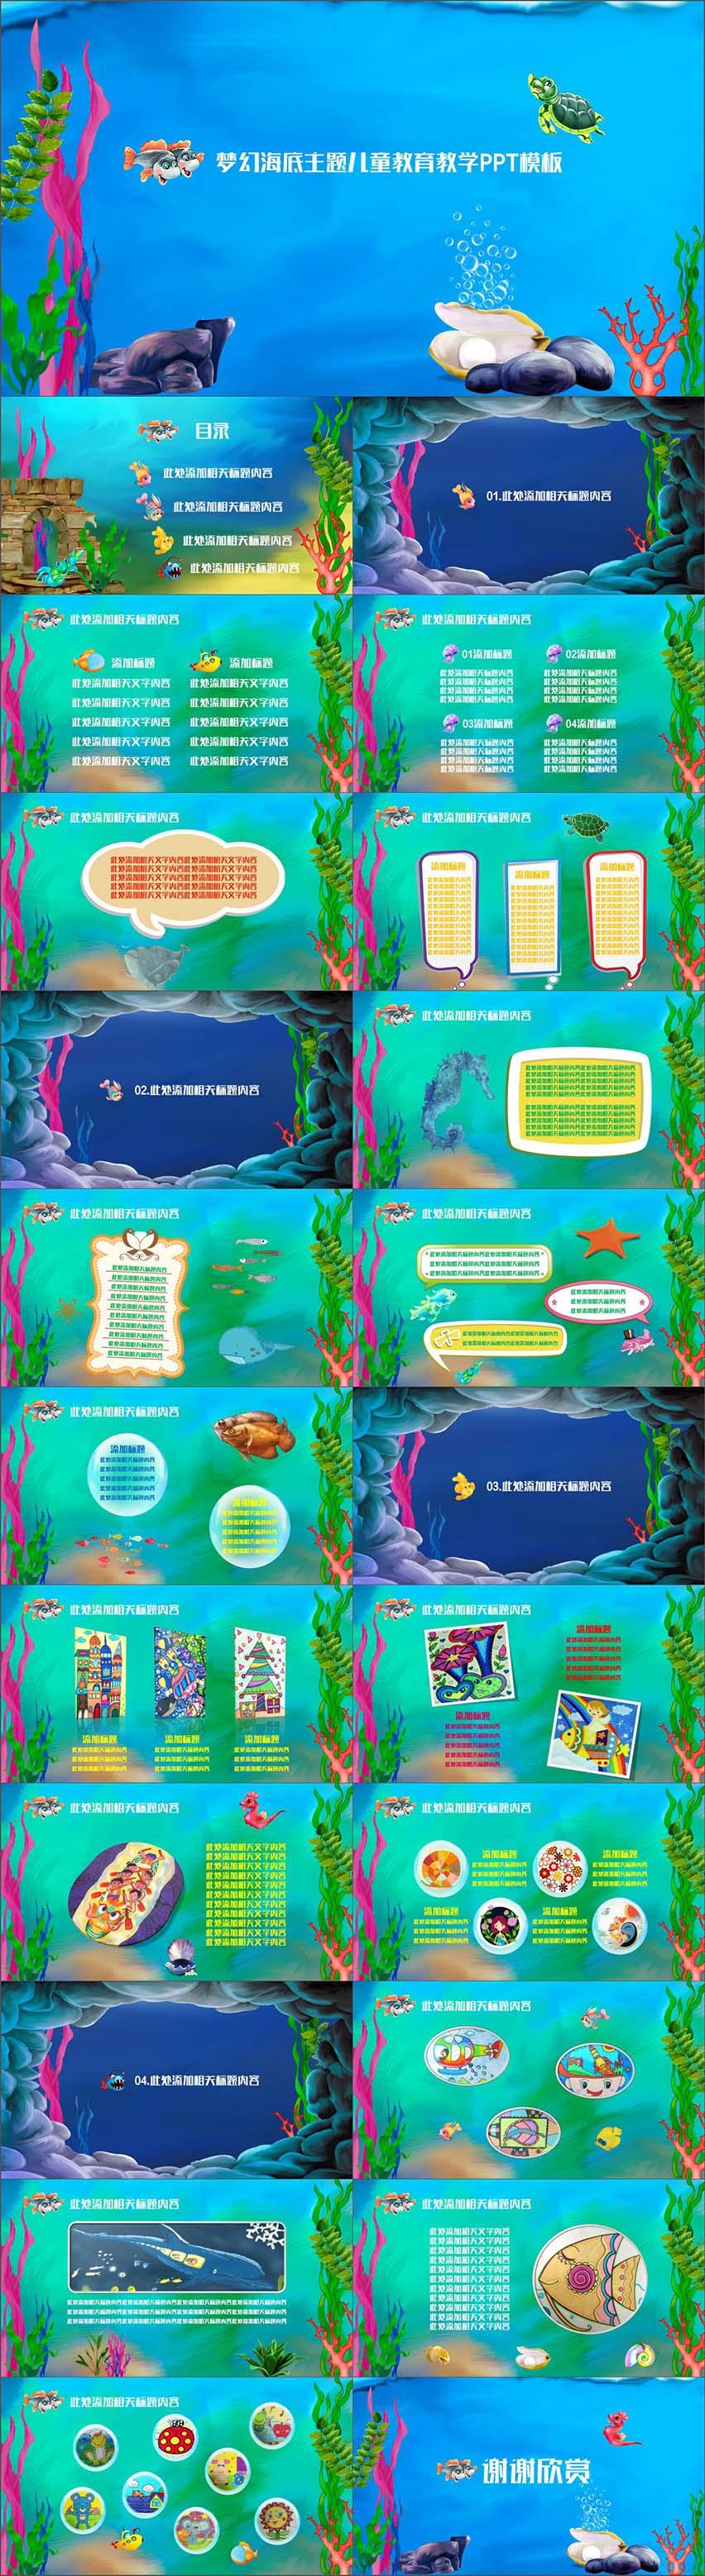 "ppt模板梦幻海底主题儿童教育教学PPT模板免费下载"""